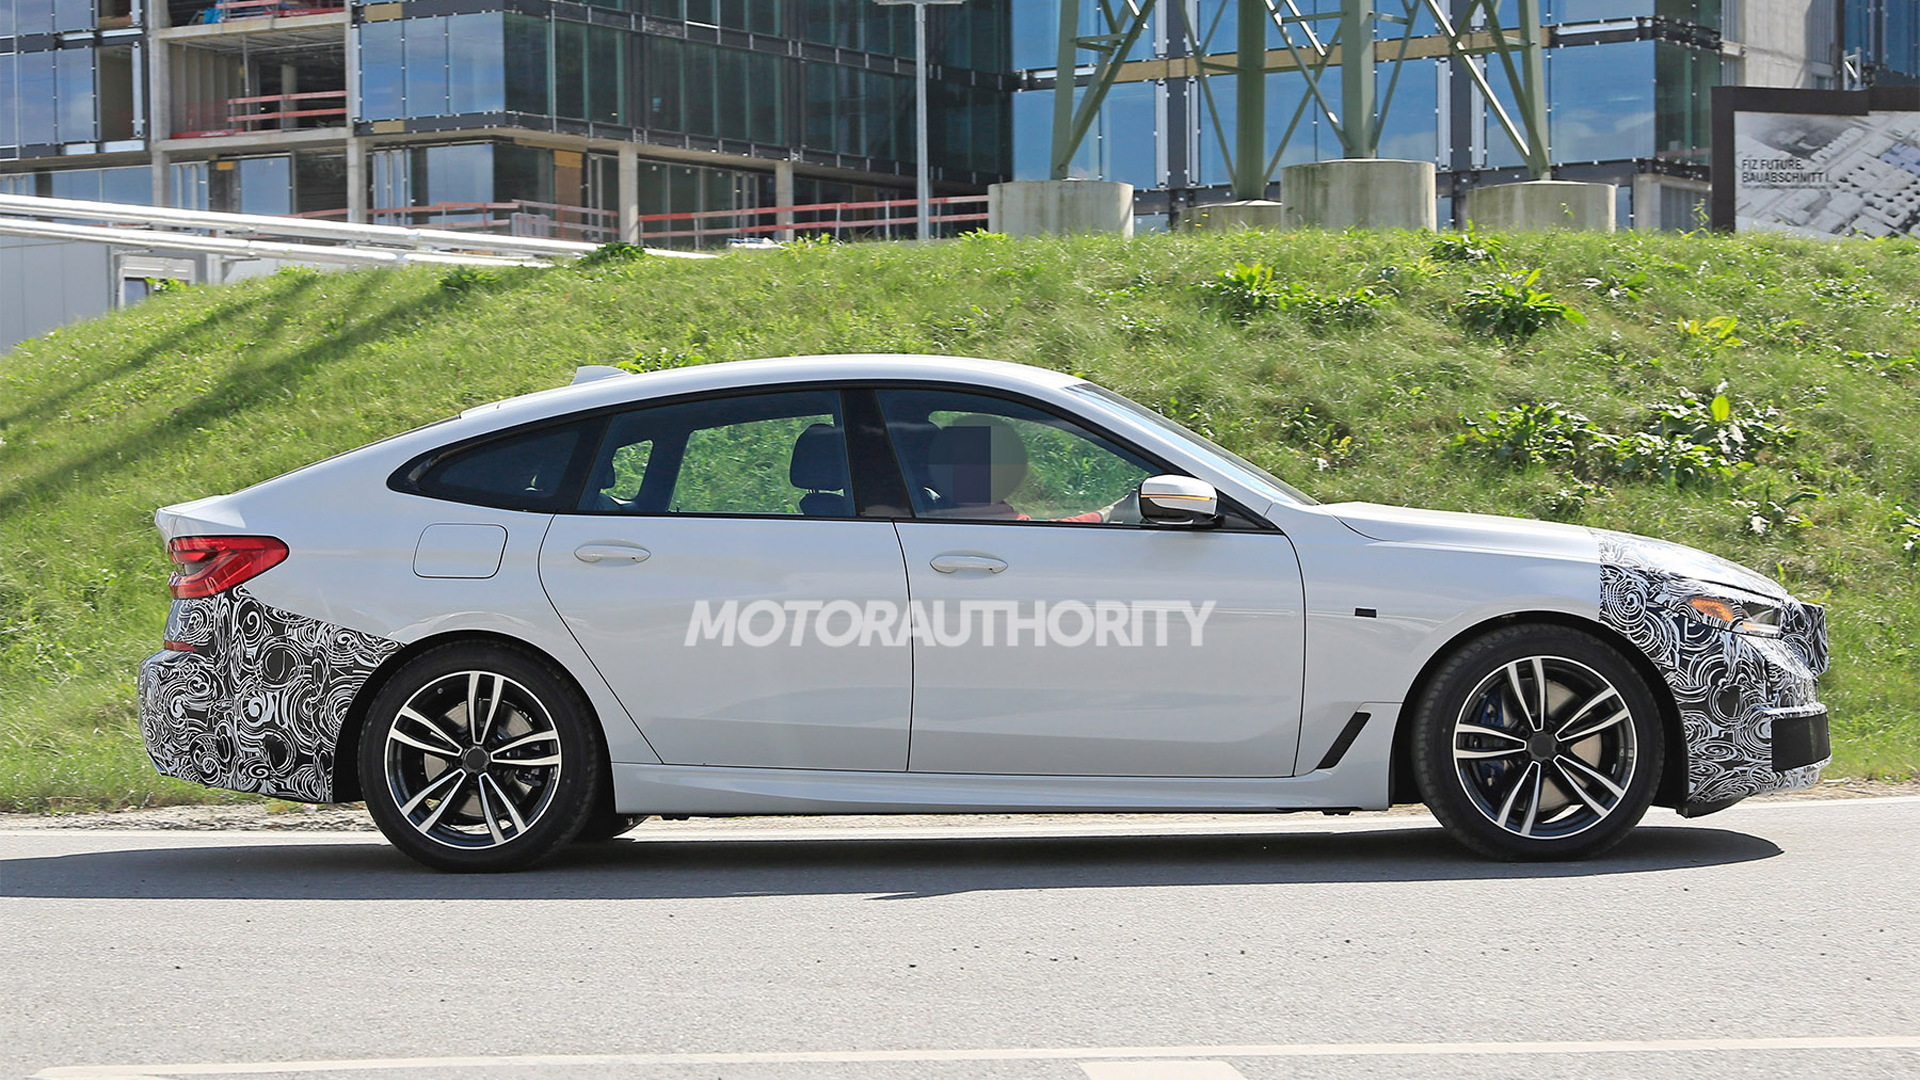 2021 BMW 6-Series Gran Turismo facelift spy shots - Photo credit: S. Baldauf/SB-Medien